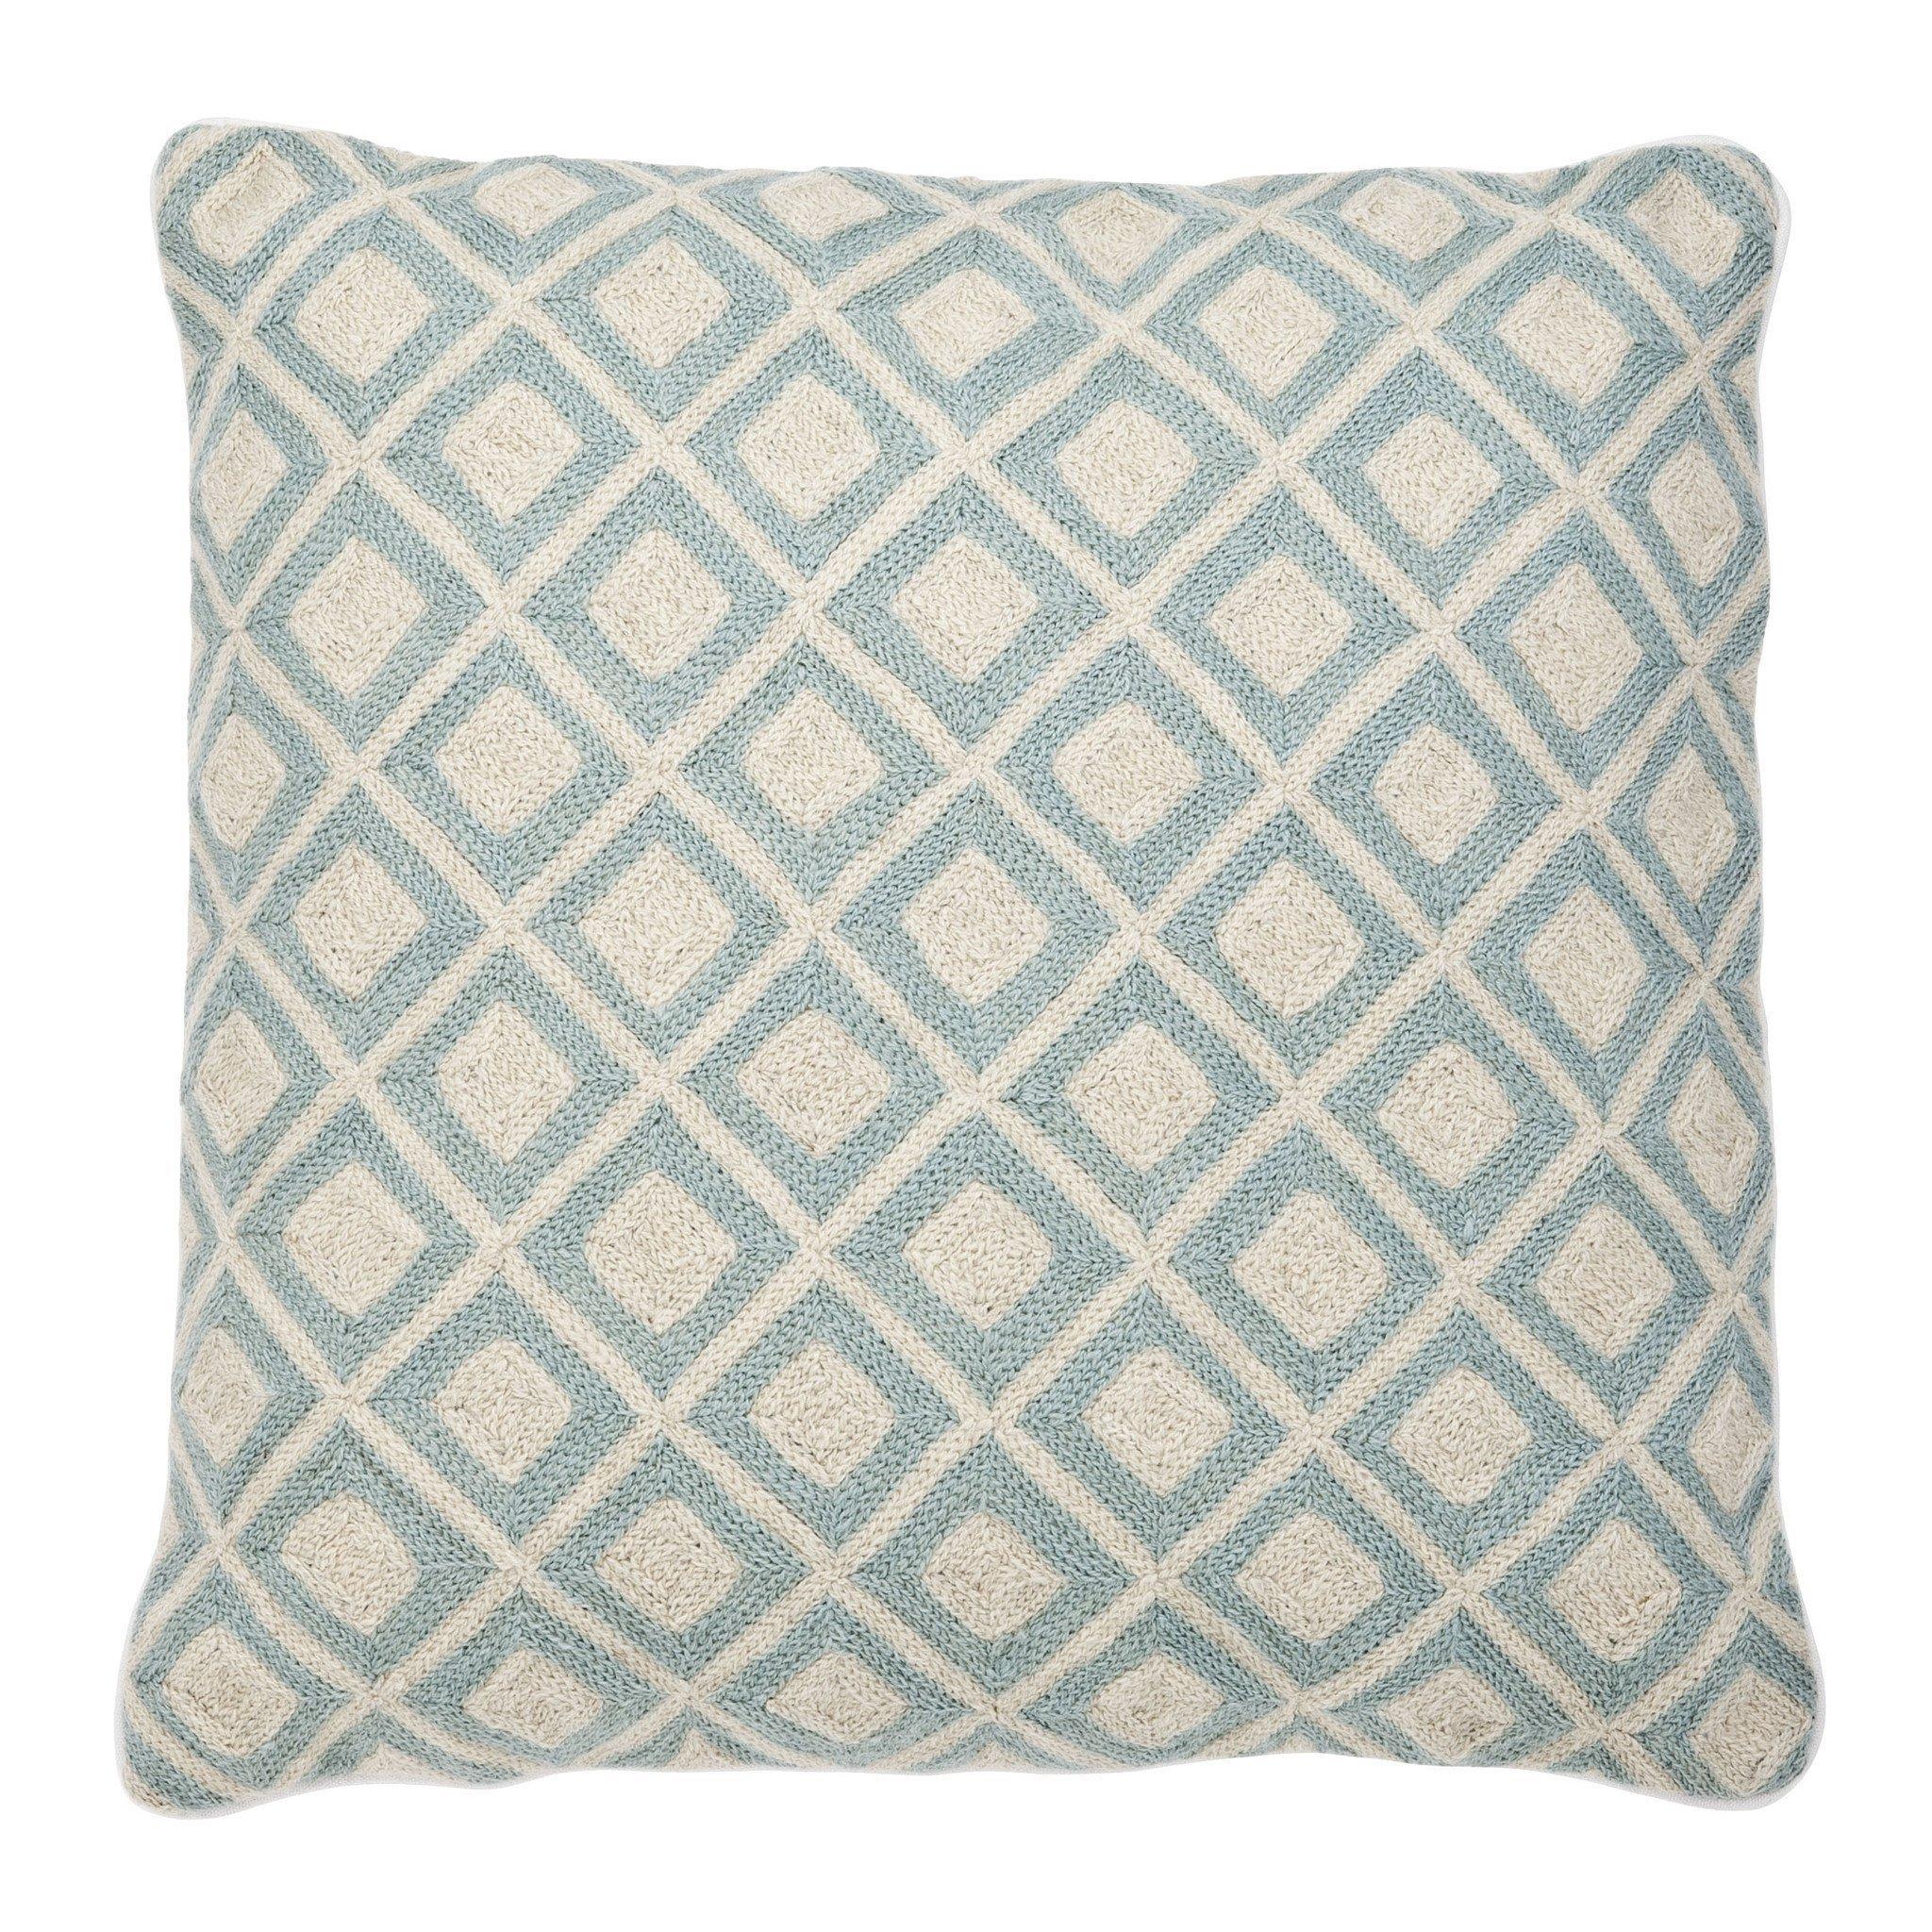 Light Blue Pillow | Eichholtz Licorice by Eichholtz